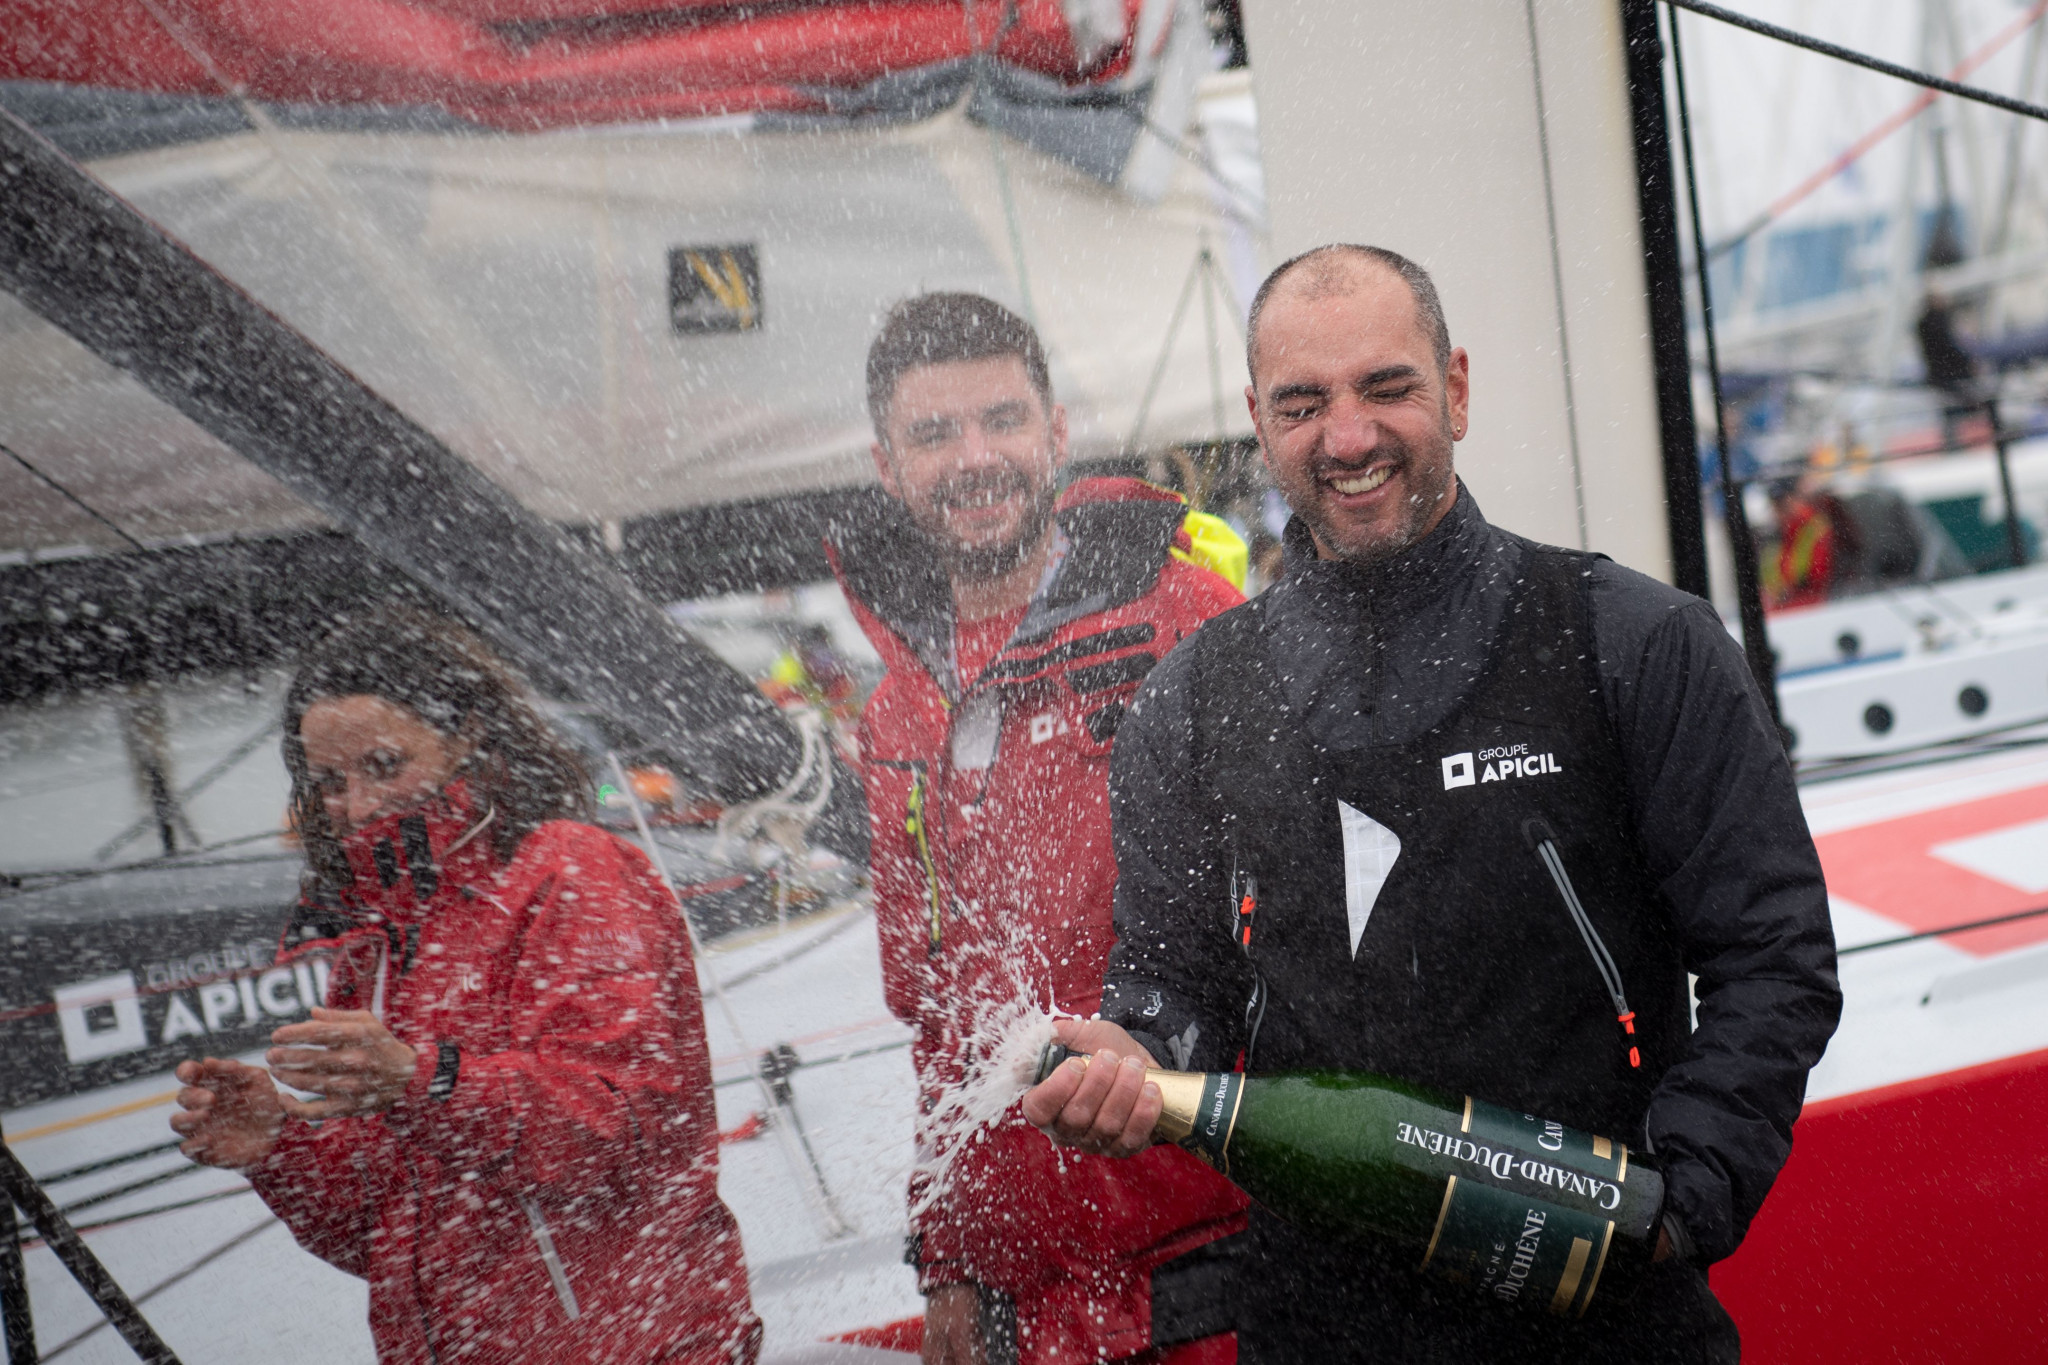 Seguin becomes first Para-sailor to complete Vendée Globe